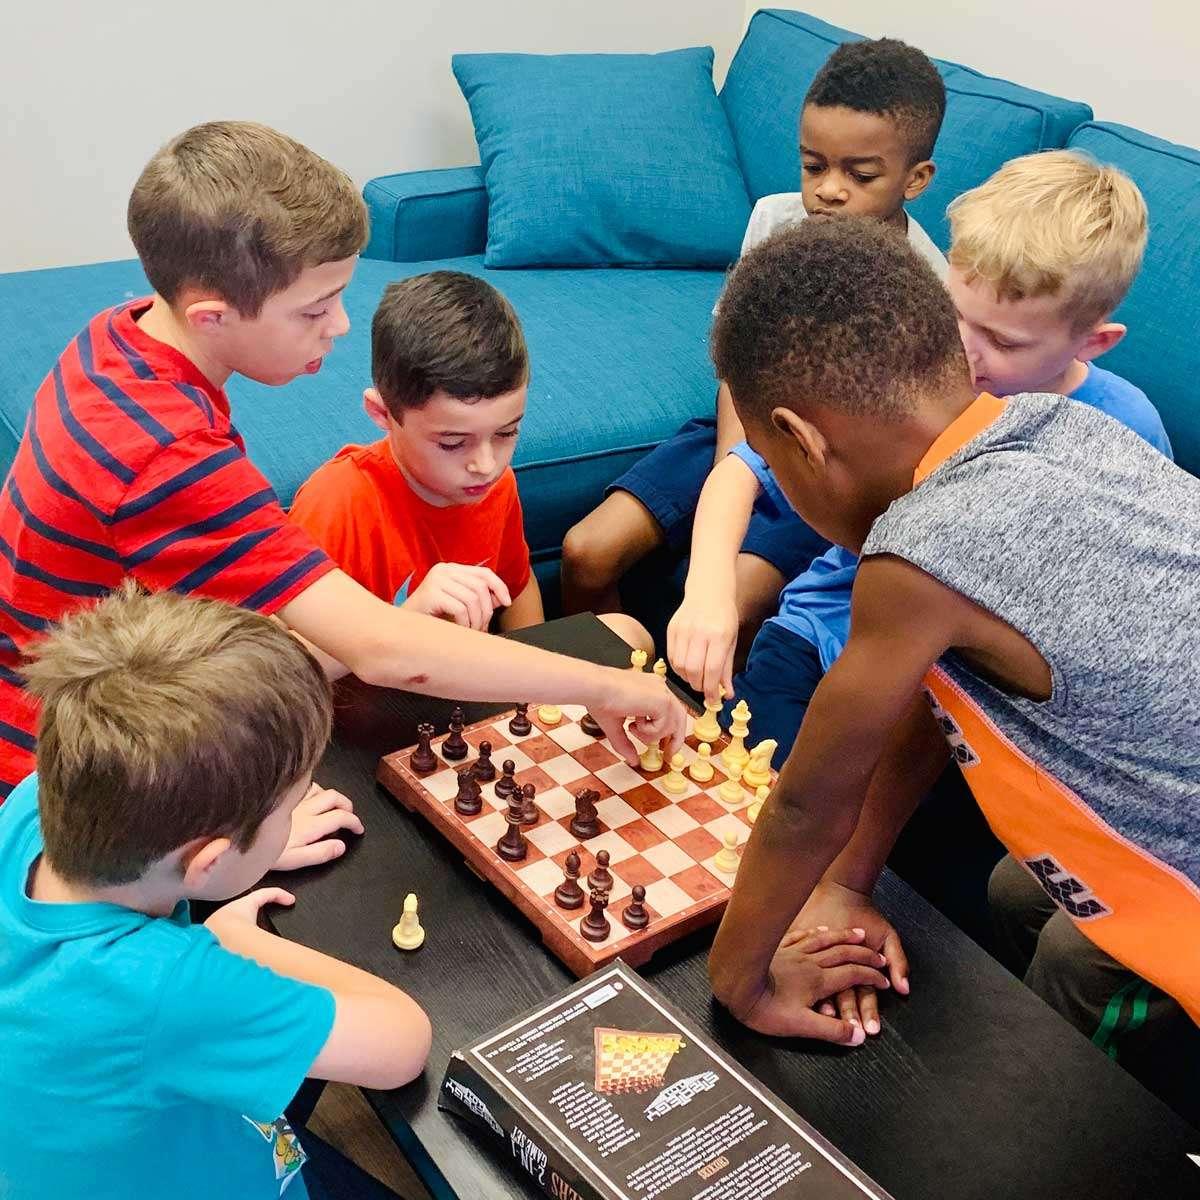 boys-chess-1200x1200.jpg